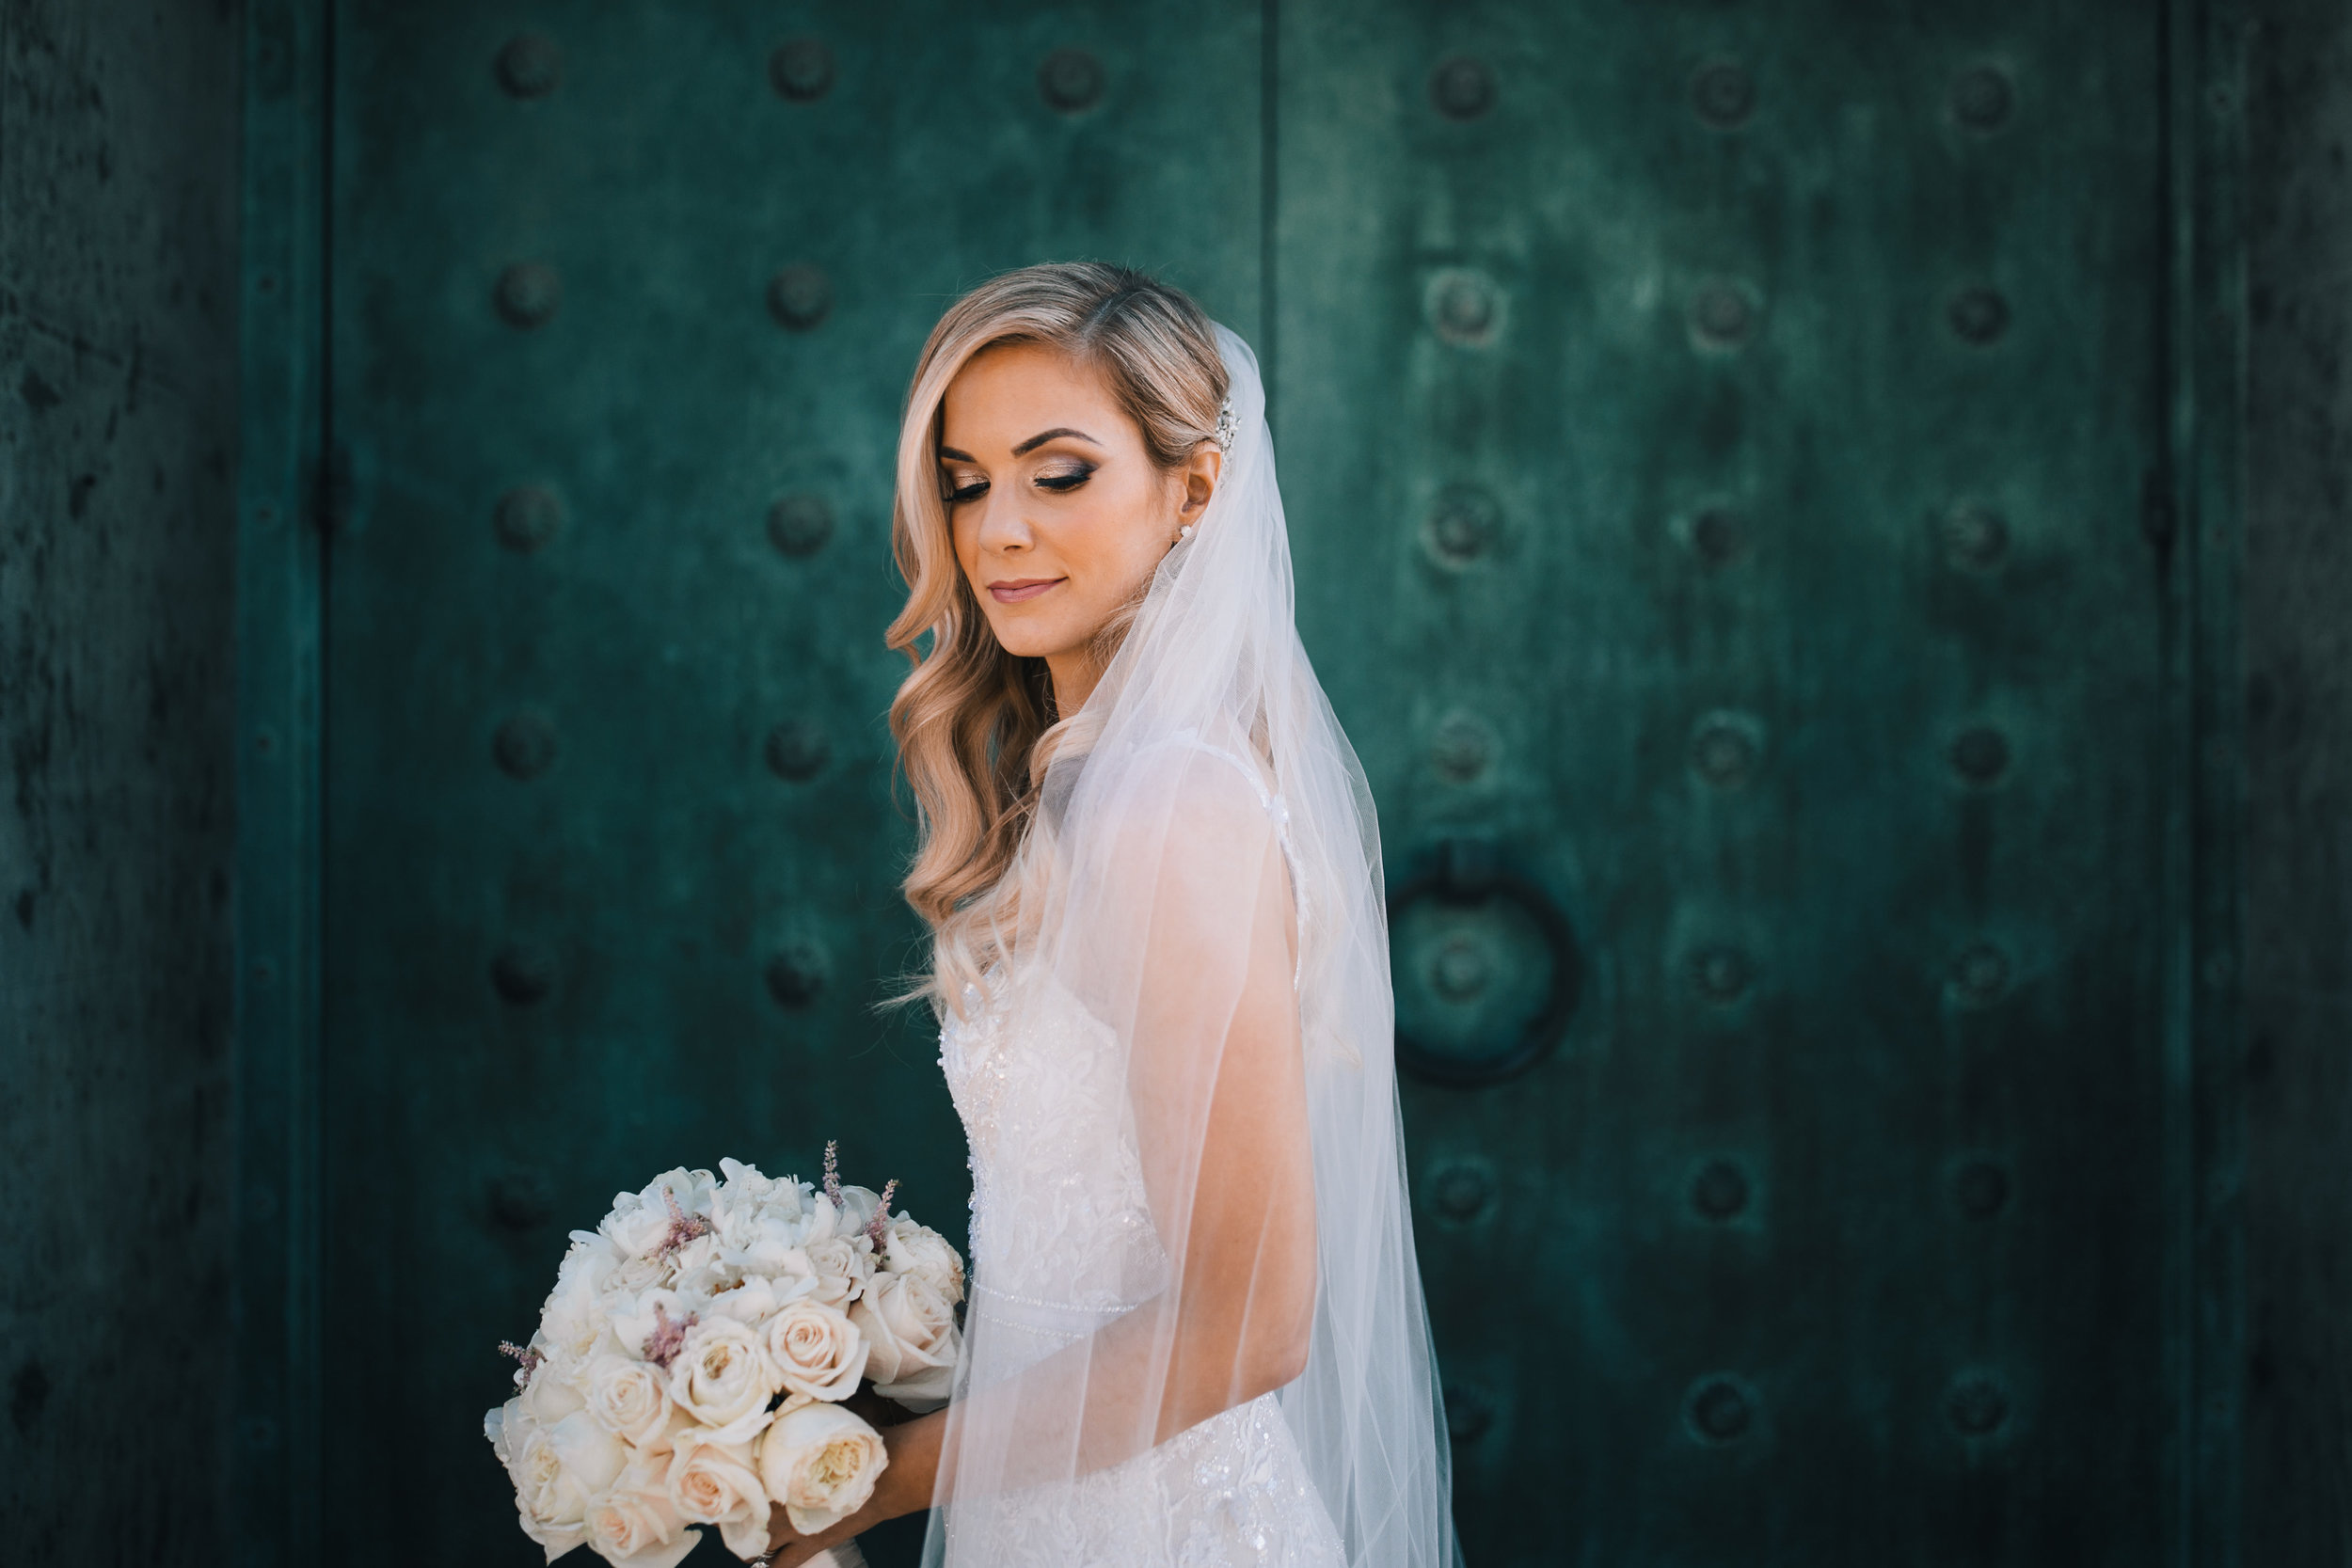 2018.09.08 Litsa and Sofo Greek Wedding Sneak Peak-11.jpg